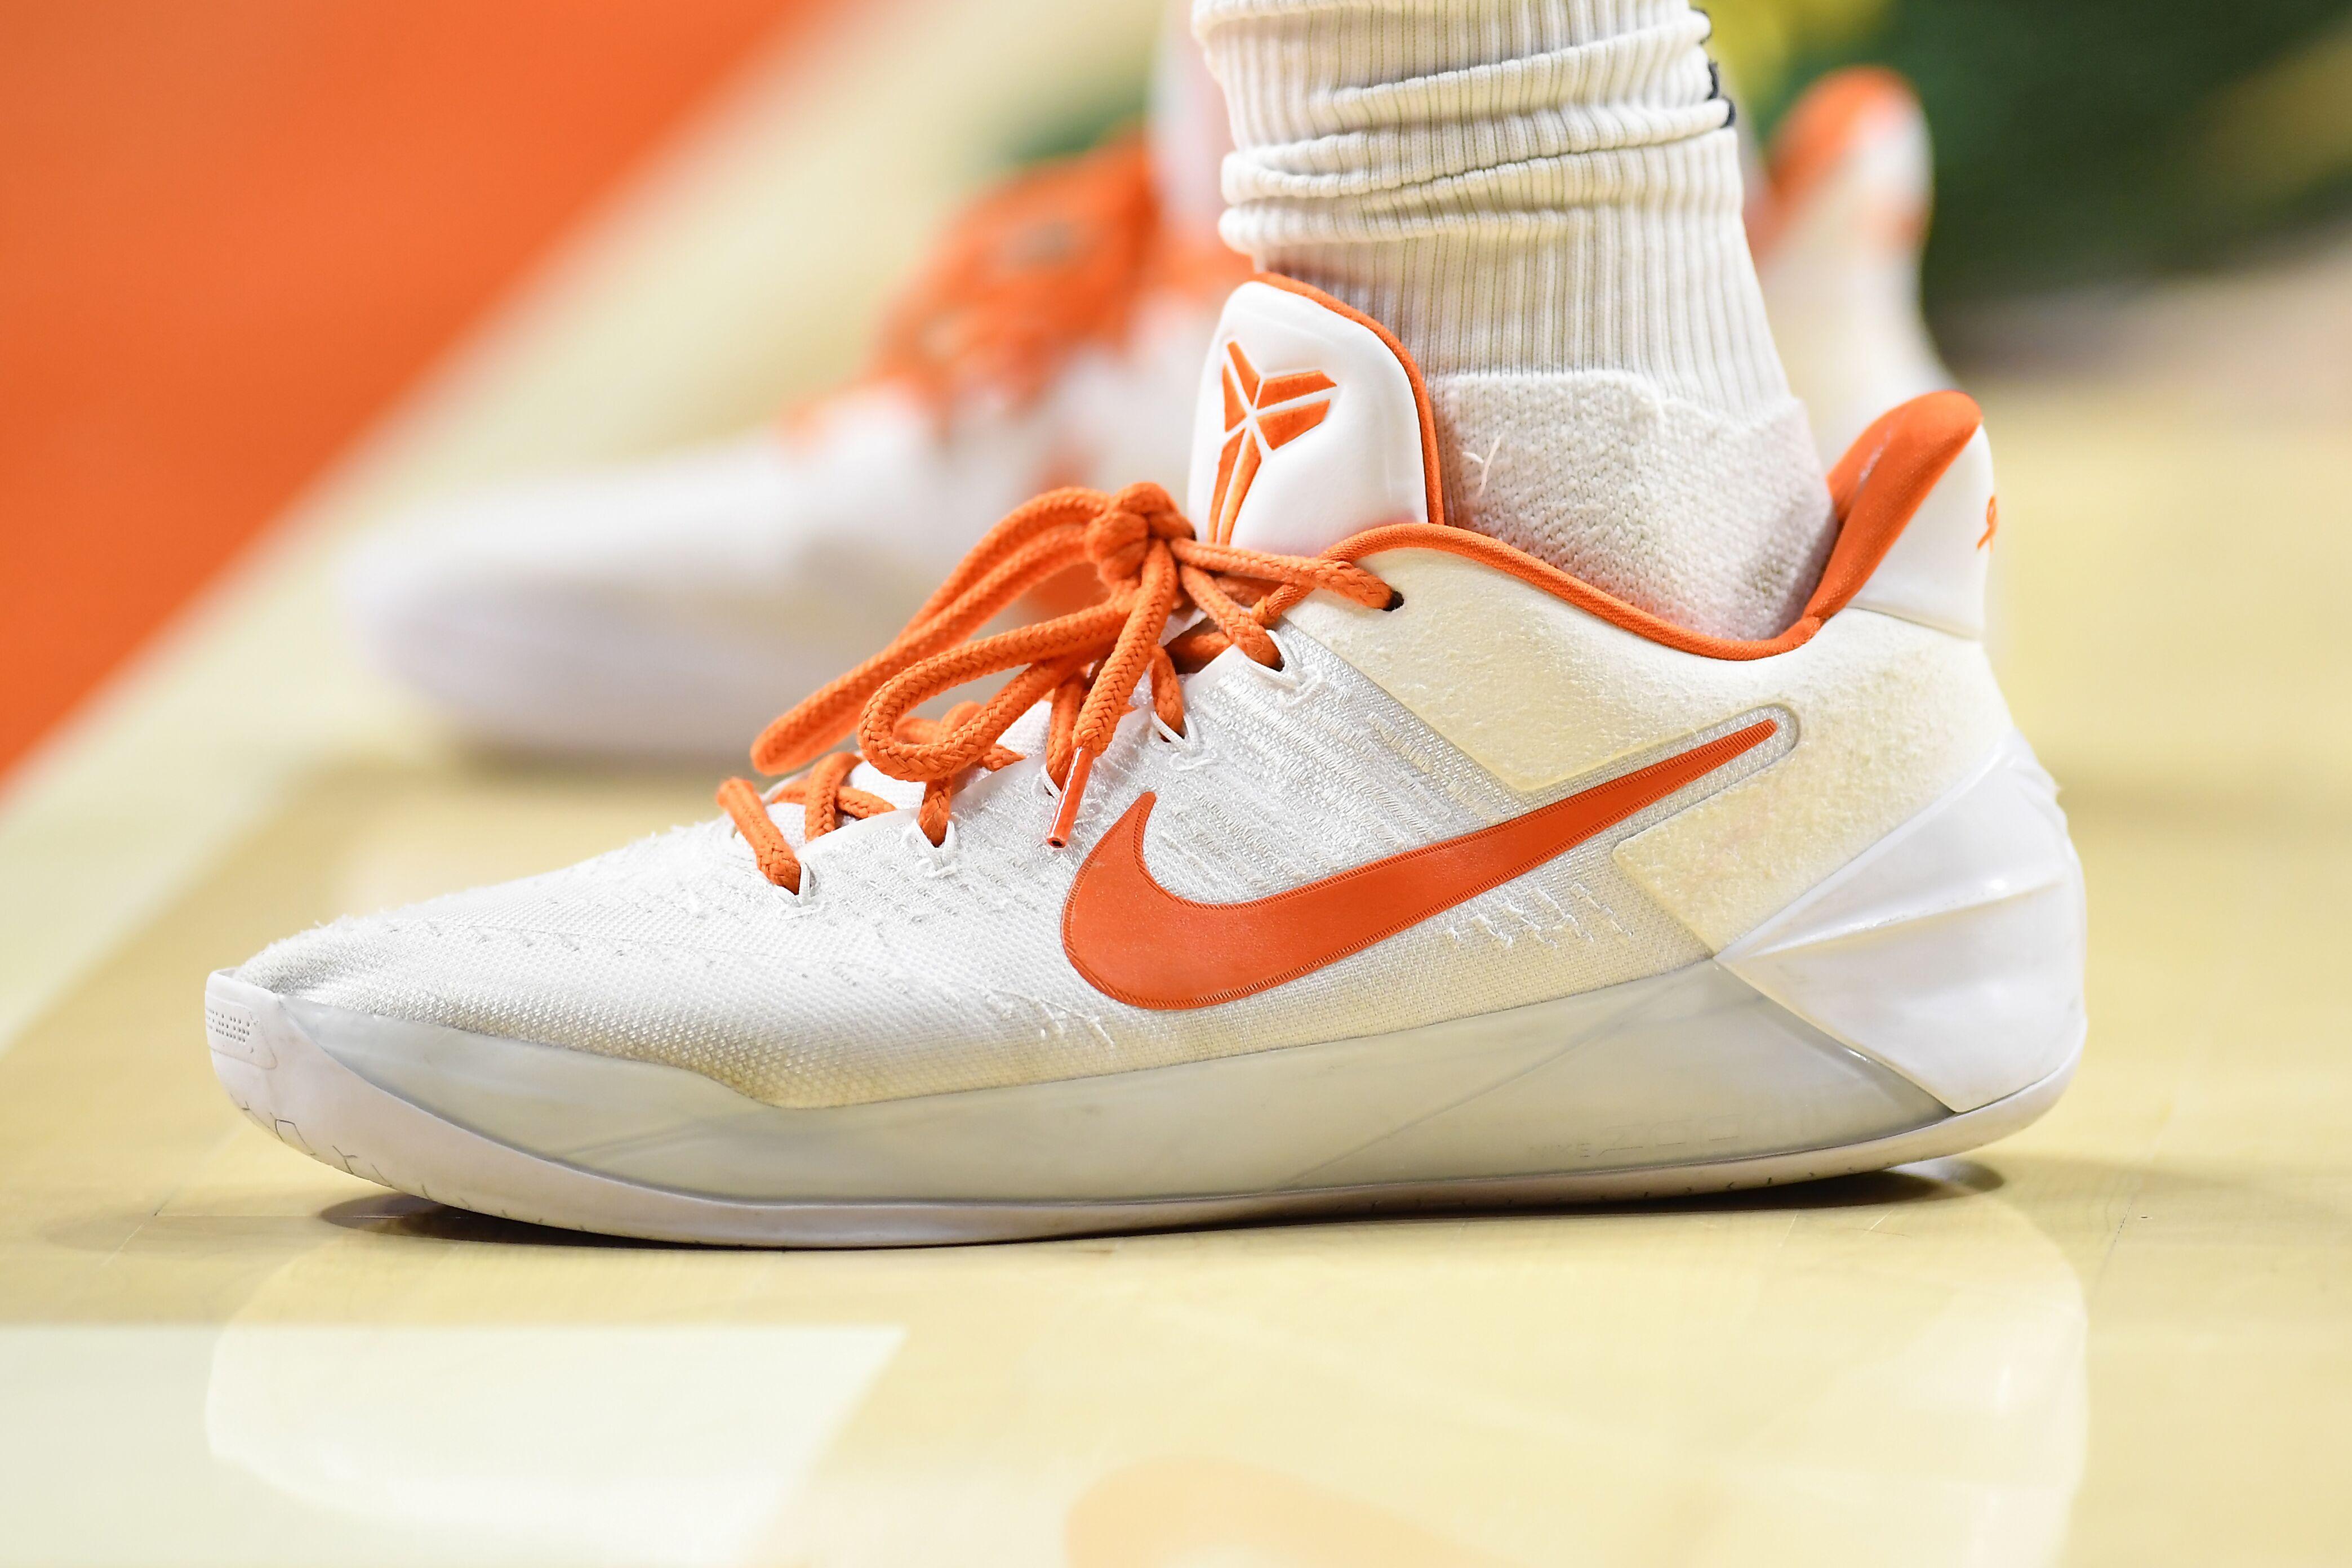 909405338-college-basketball-jan-22-michigan-state-at-illinois.jpg